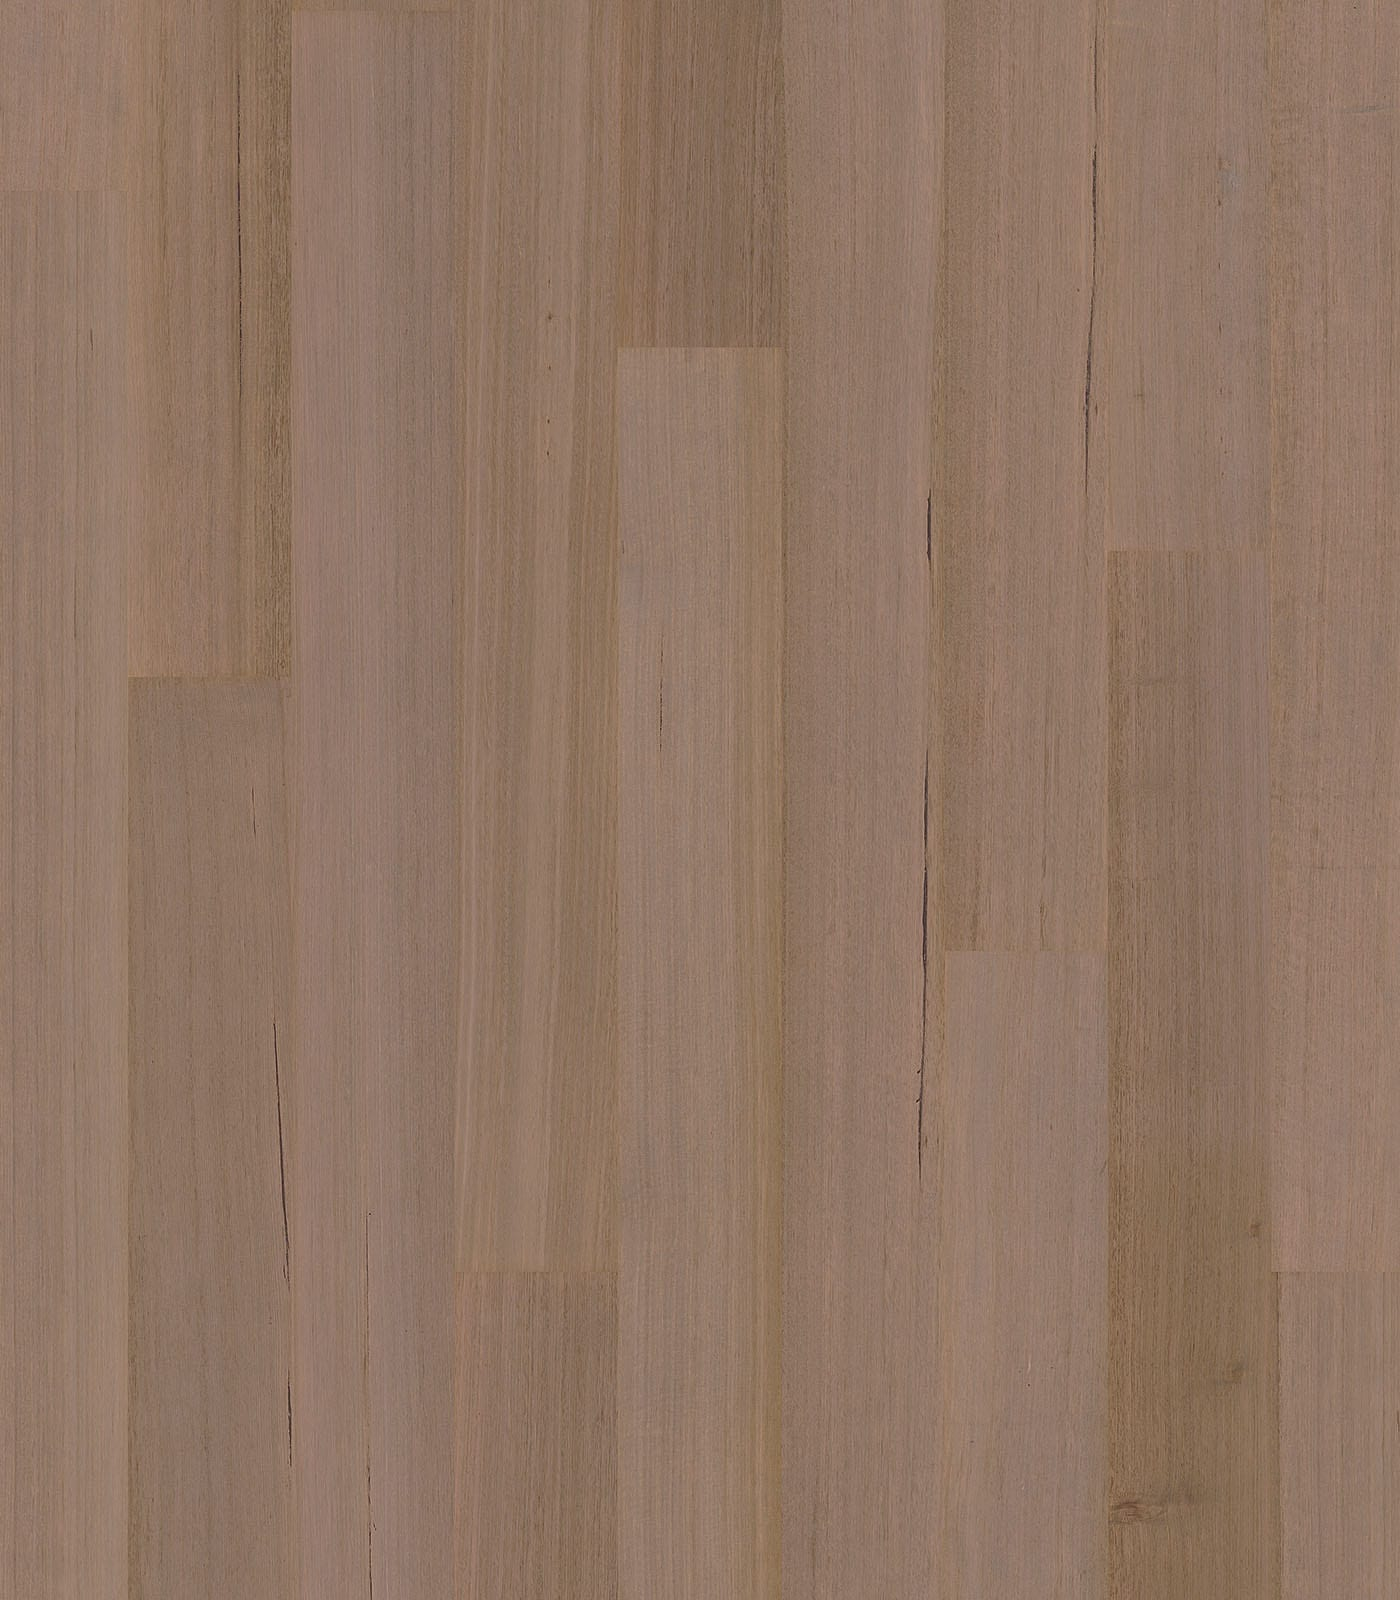 Geelong-After Oak-engineered Tasmanian Oak flooring-flat